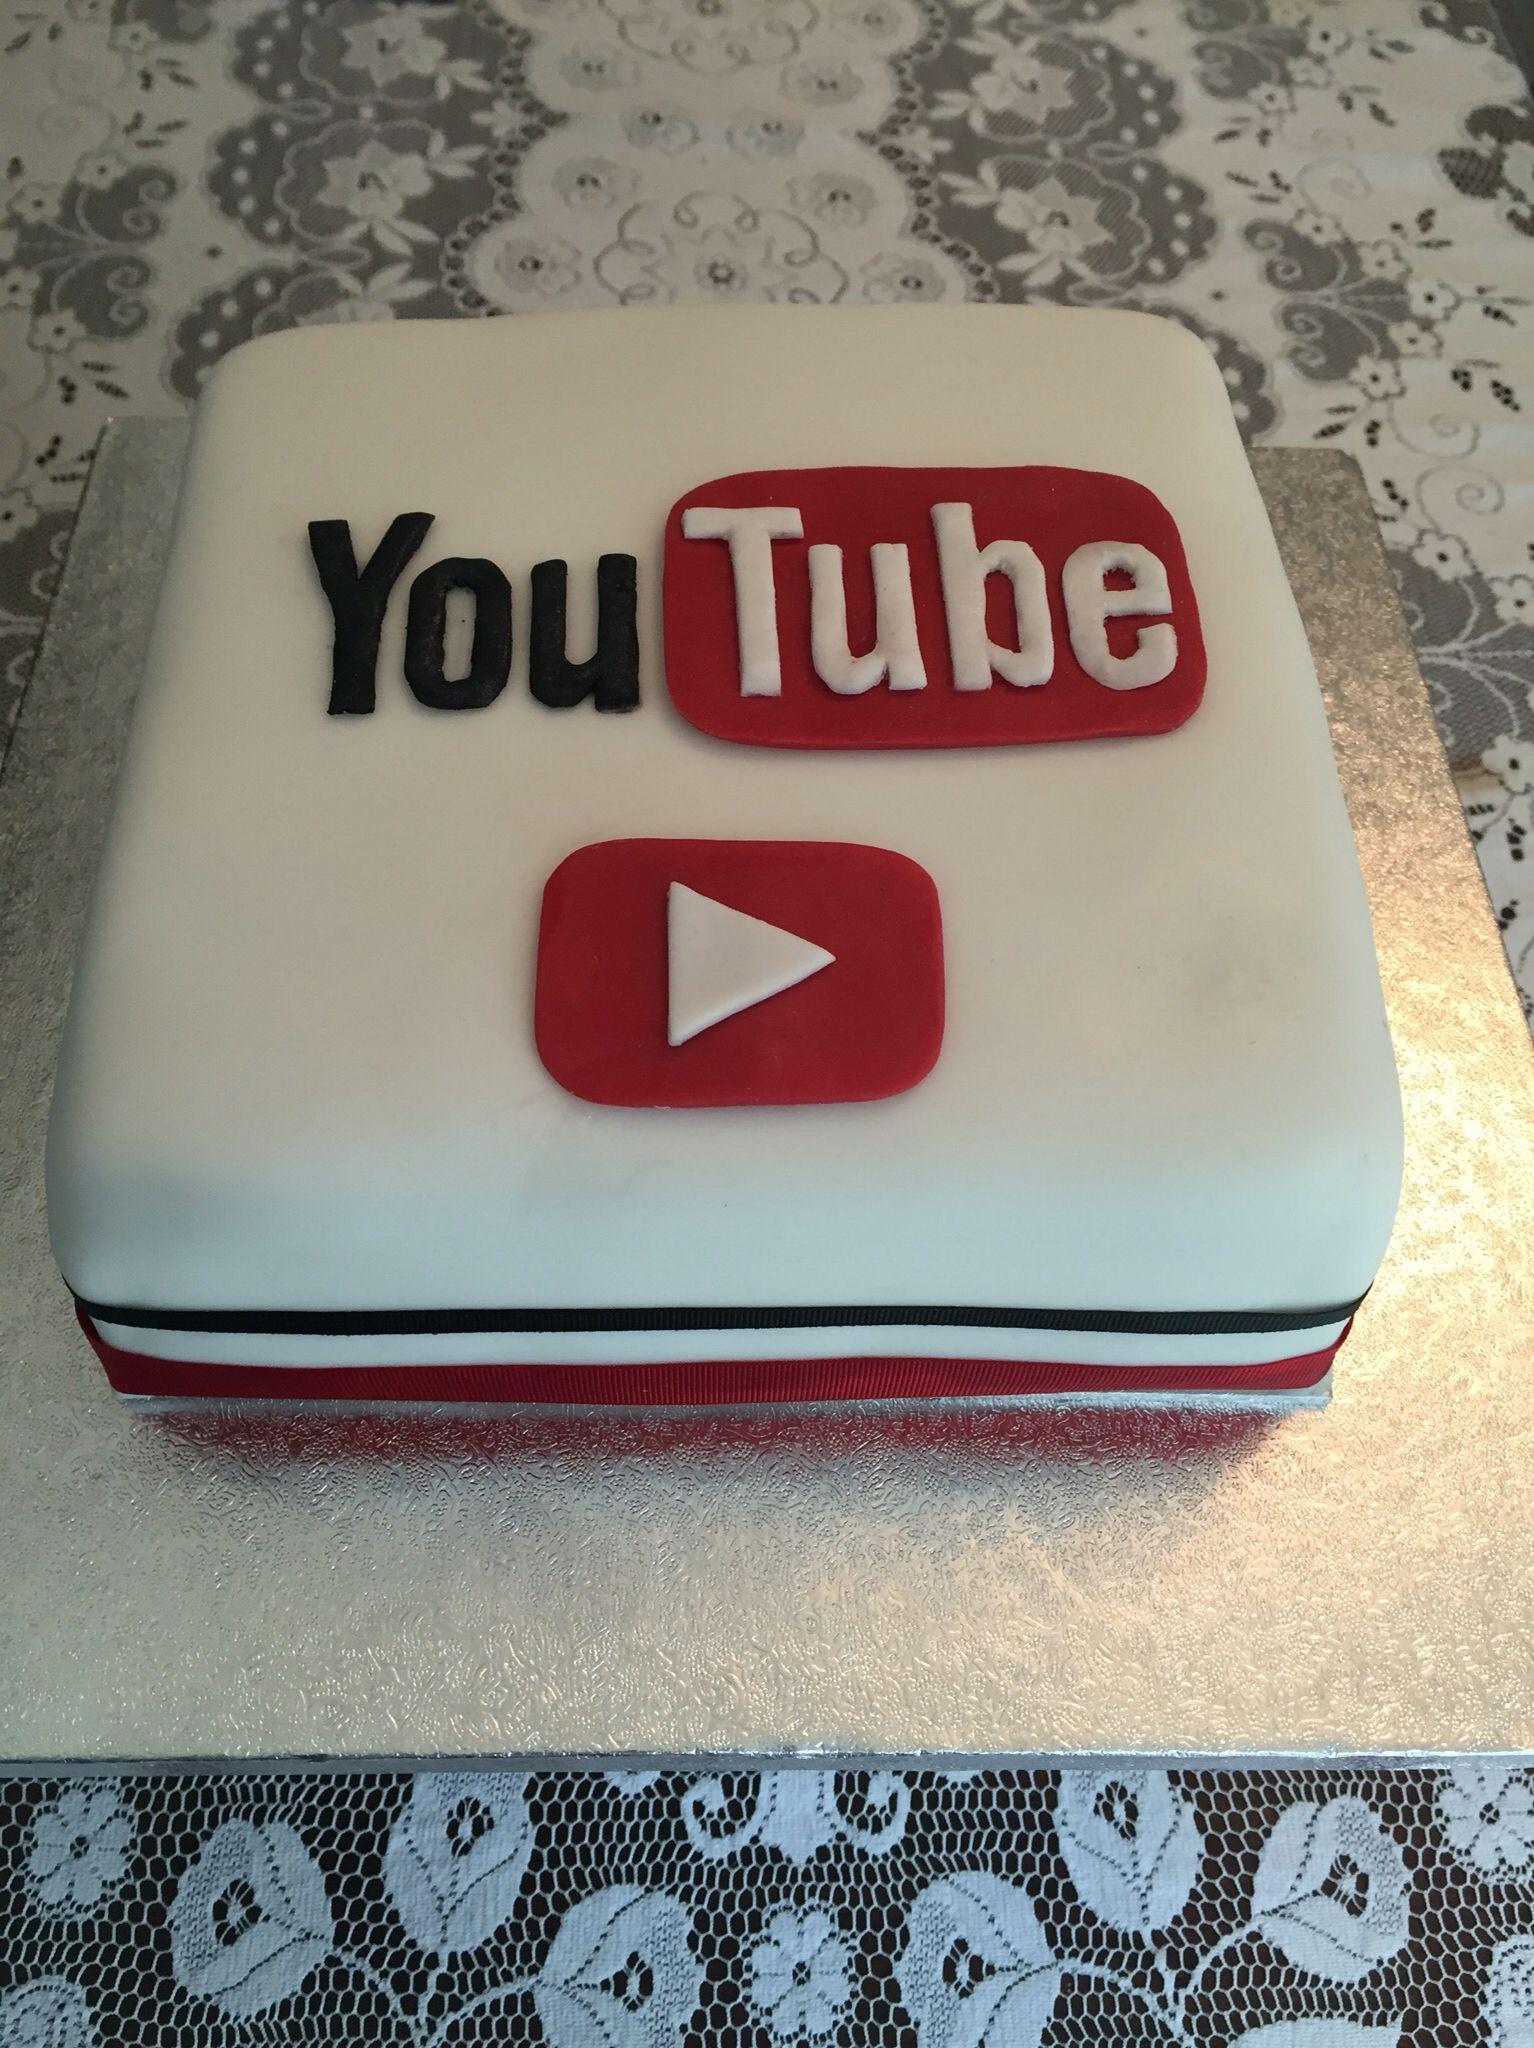 Youtube Cake Youtube Cake Decorating Cake Decorating Cake Decorating Classes